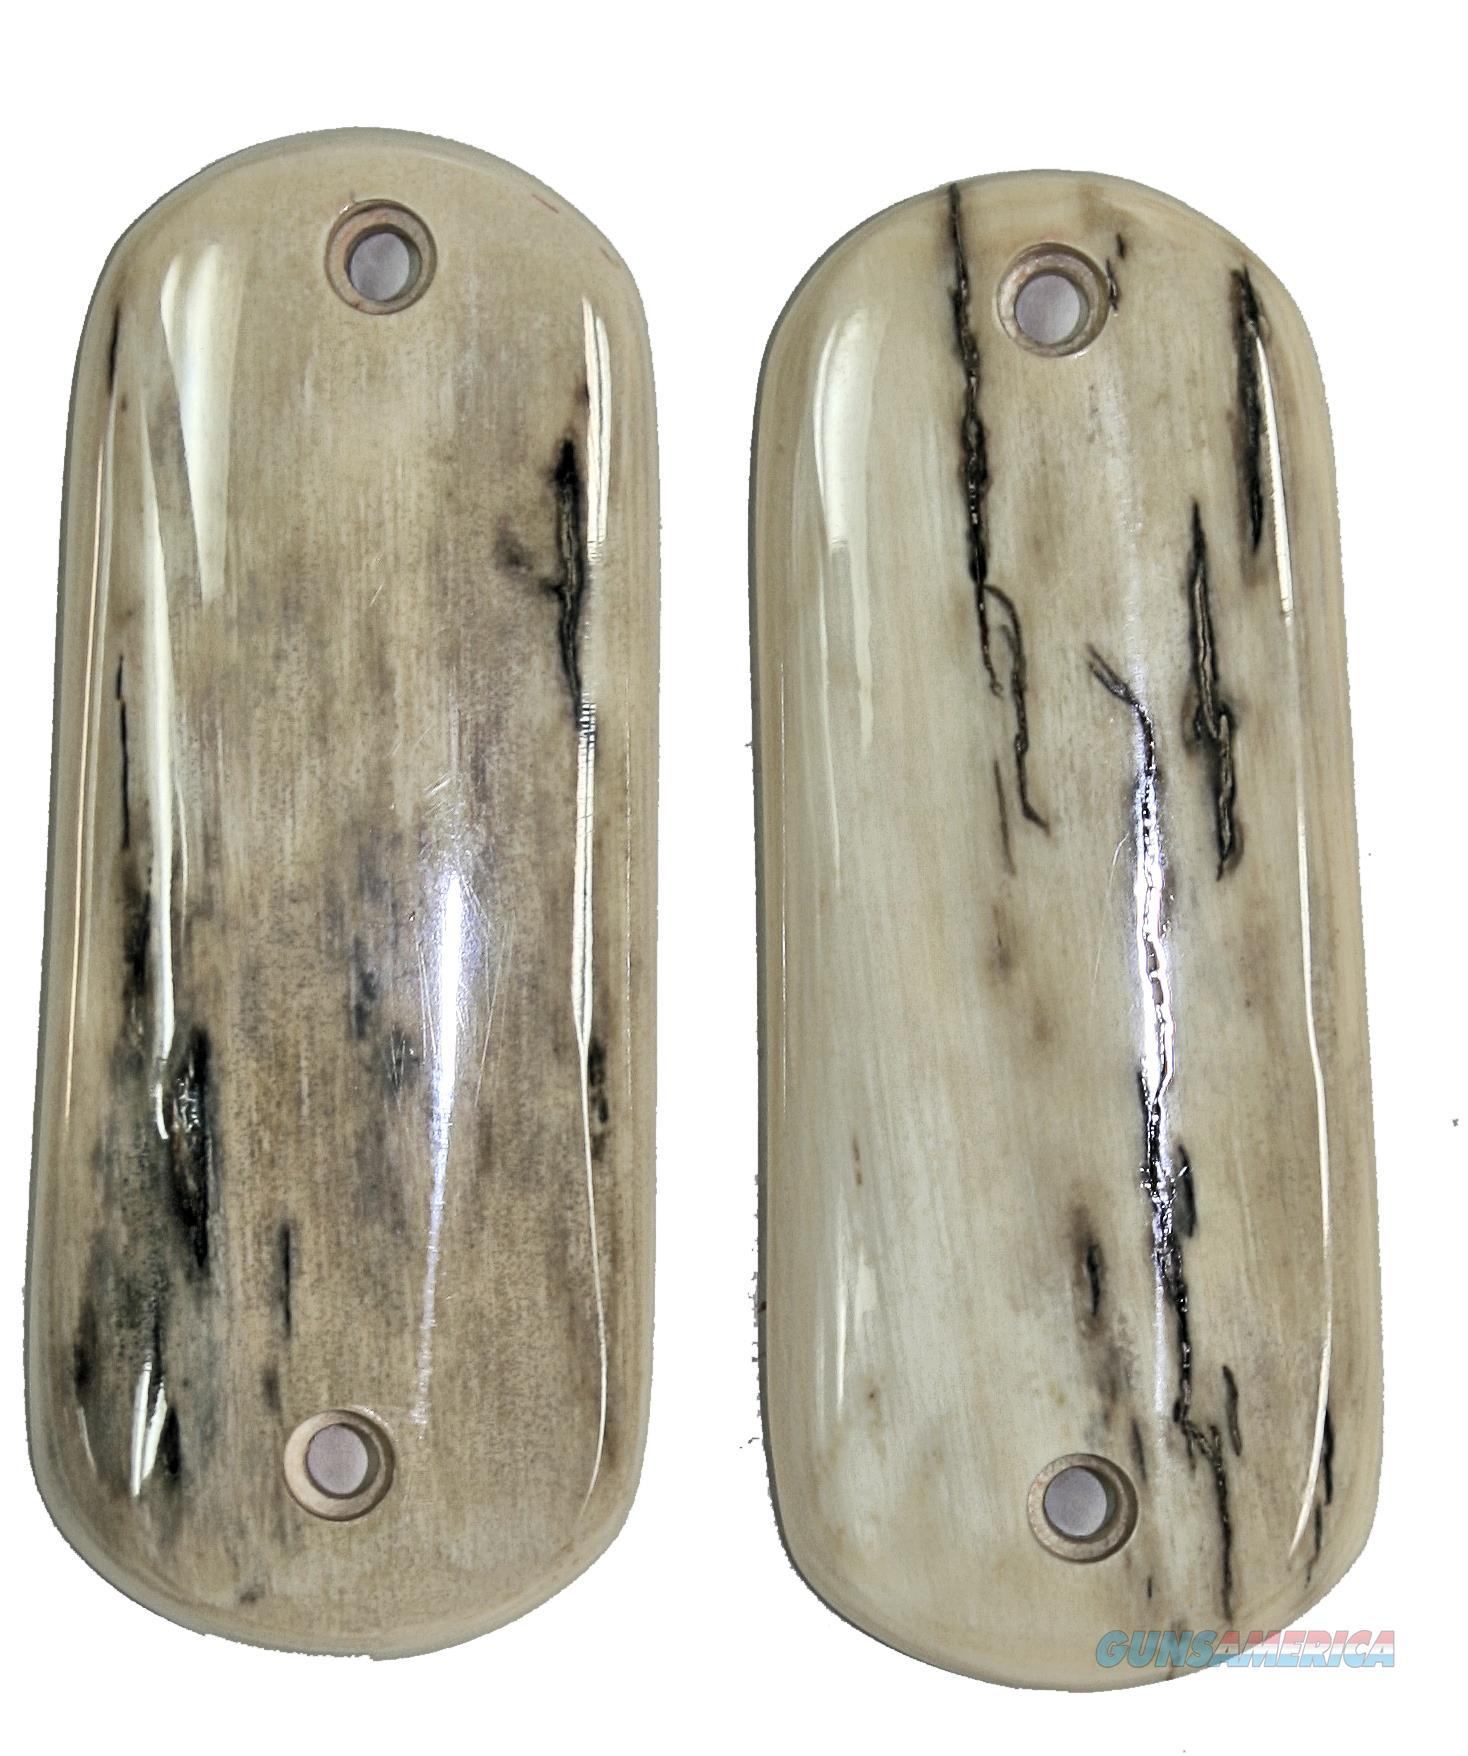 Colt 1902 Hammer Auto Siberian Mammoth Ivory Grips  Non-Guns > Gun Parts > Grips > Other